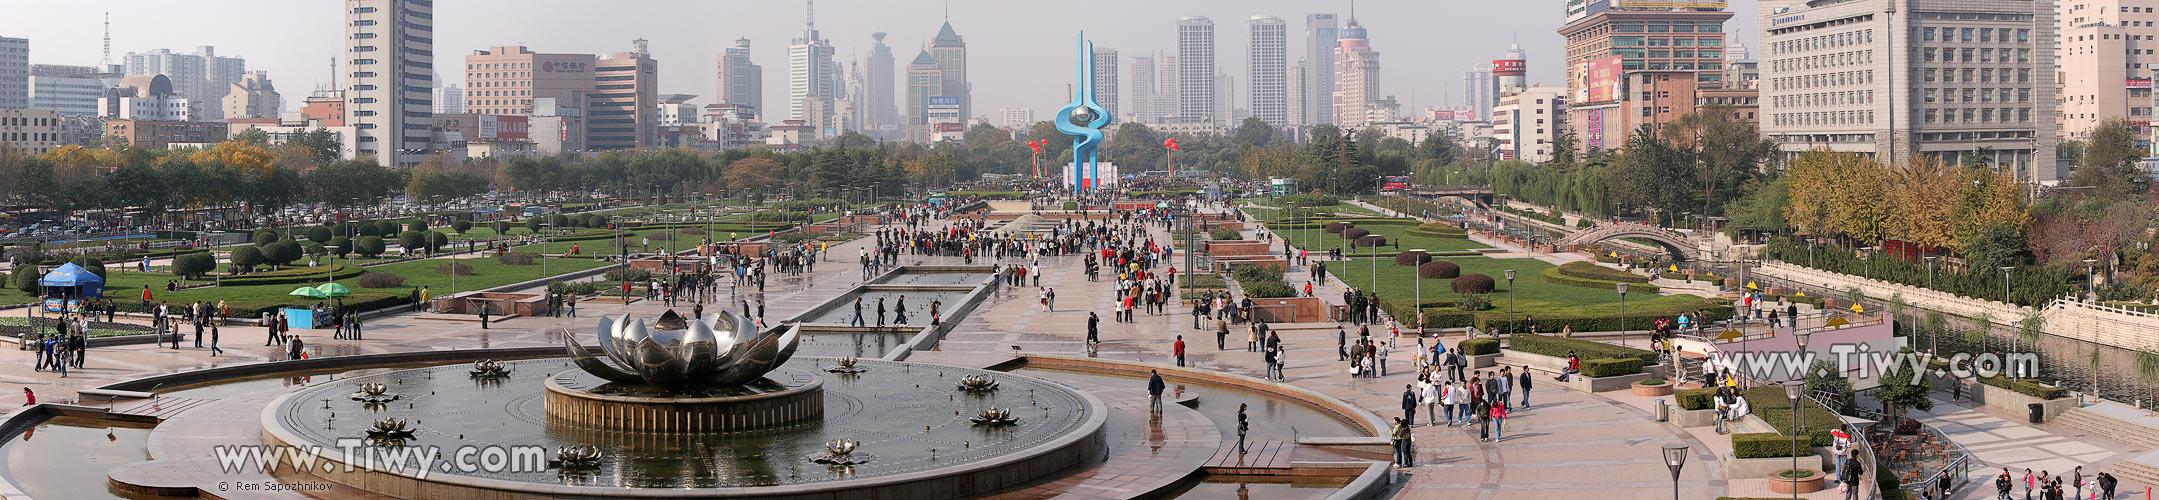 Jinan China  City pictures : Panoramic view of Jinan, China